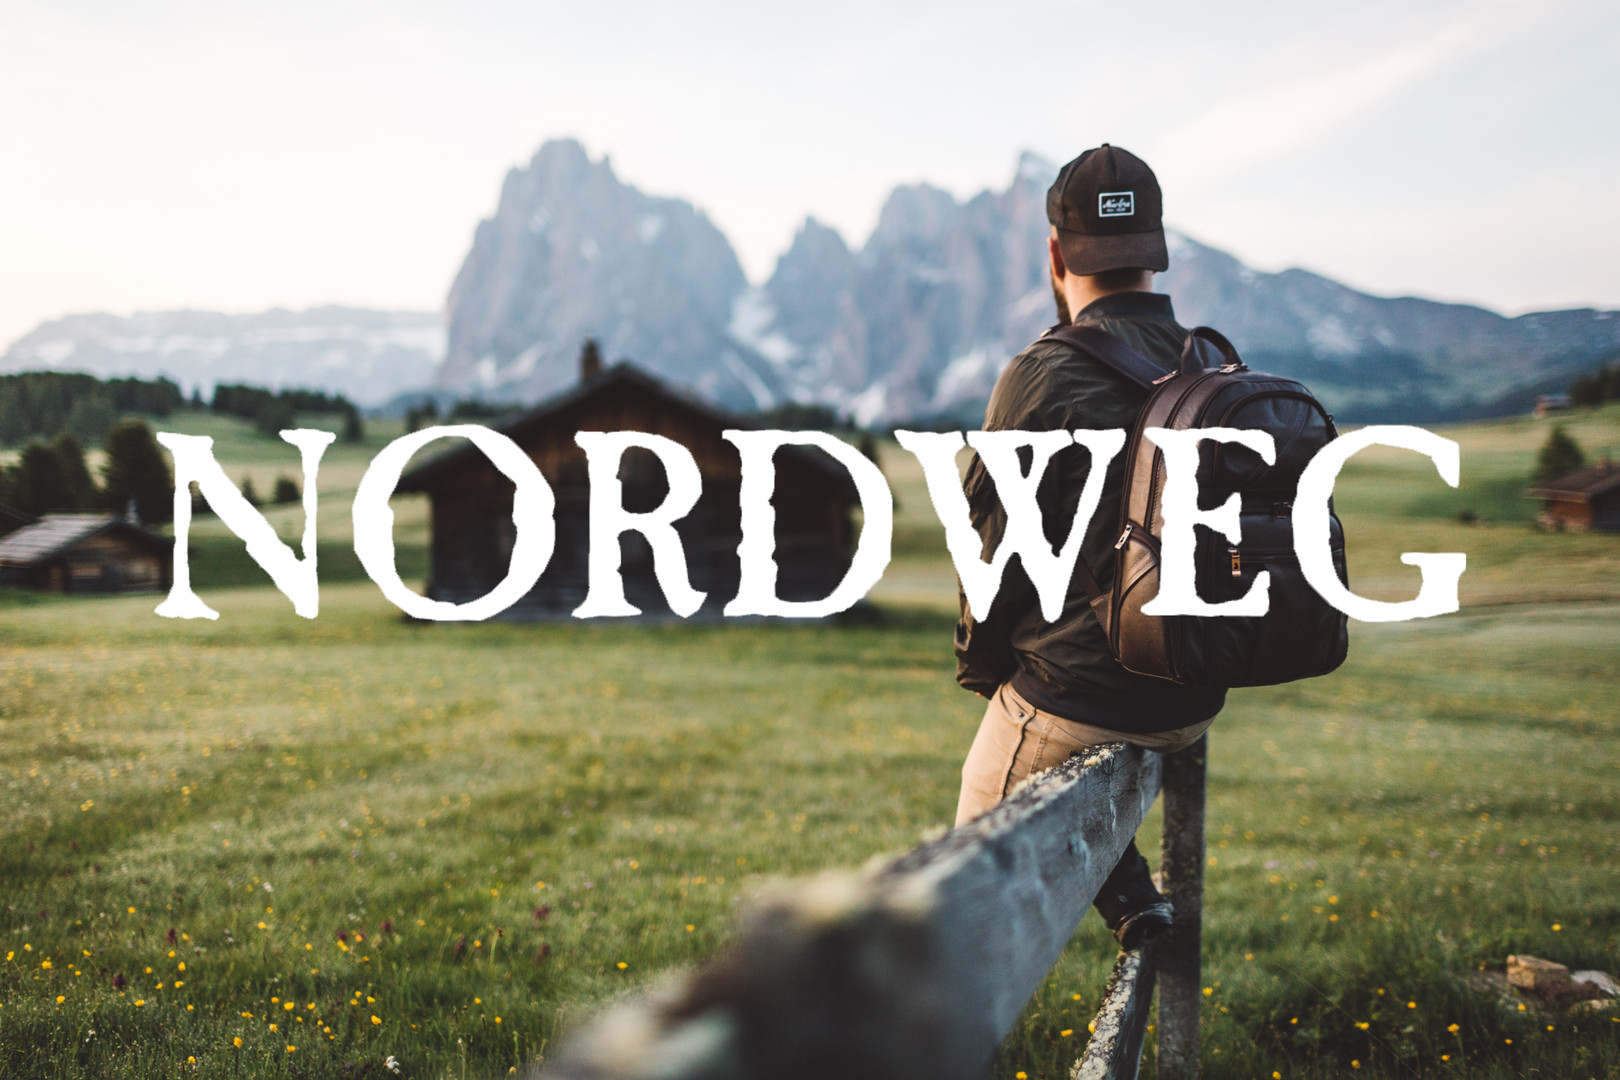 Nordweg campaigns 2019 & 2017